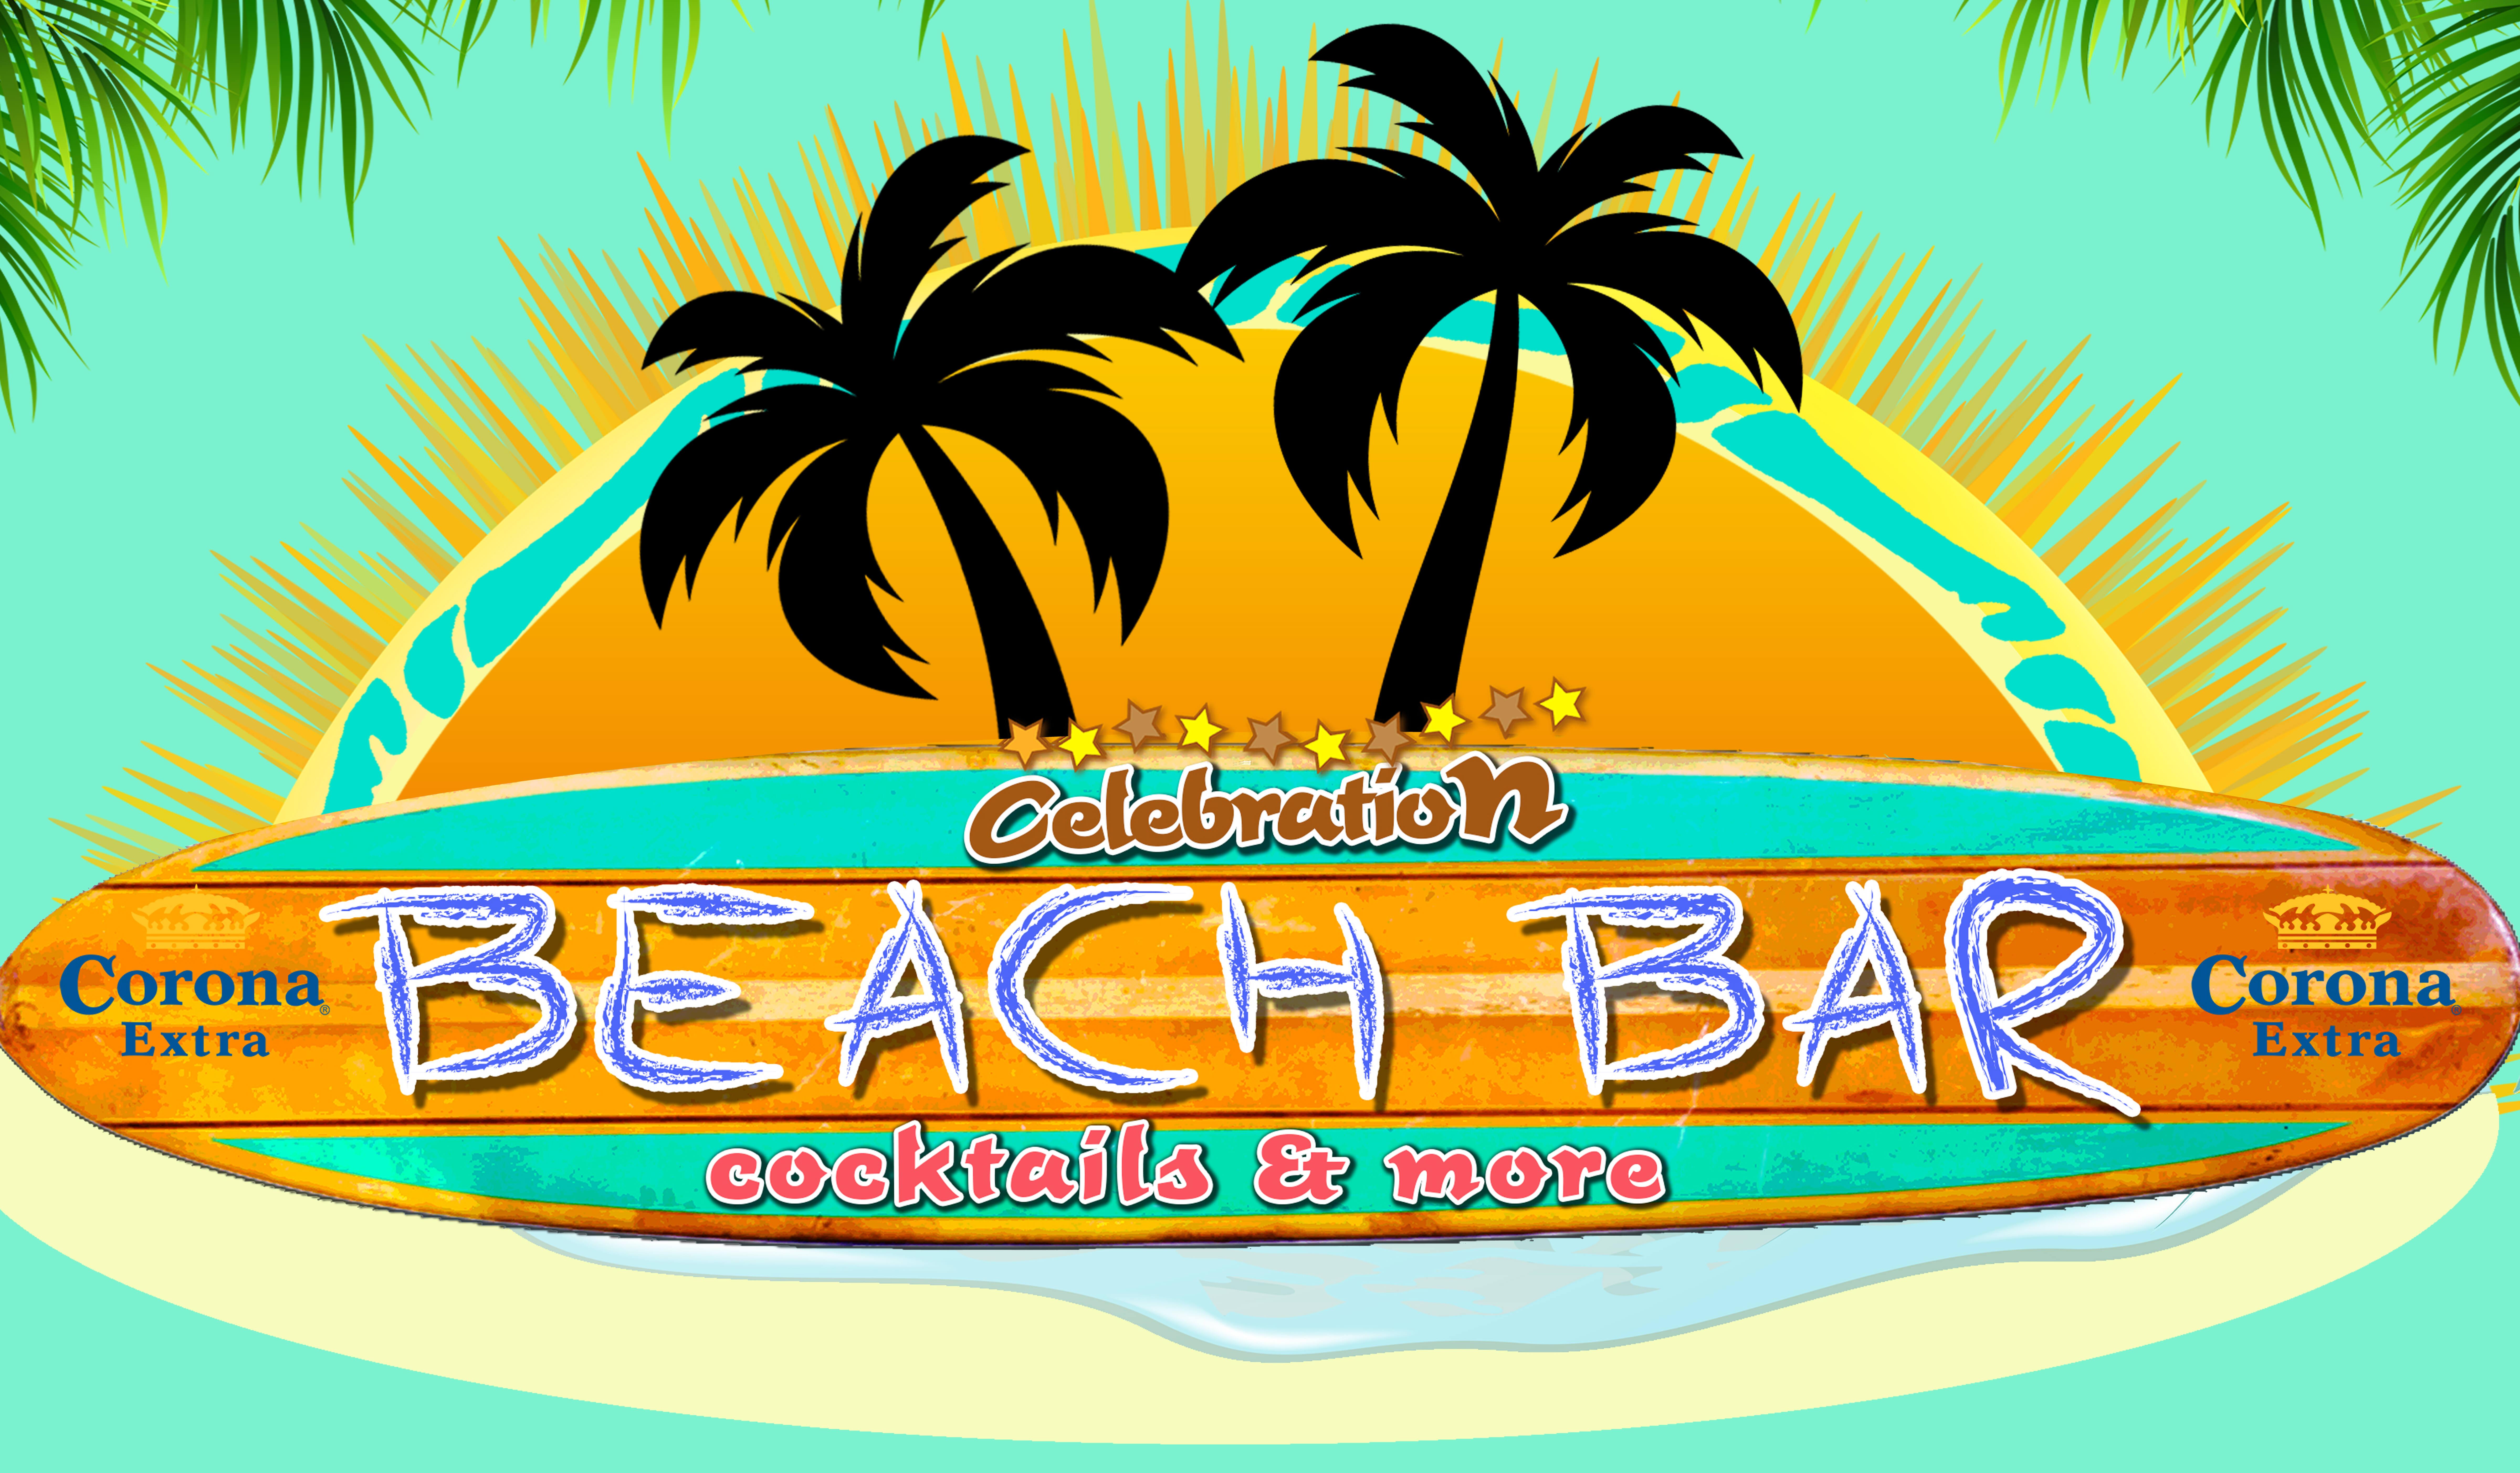 Celebration-beach-stappeninalbufeira